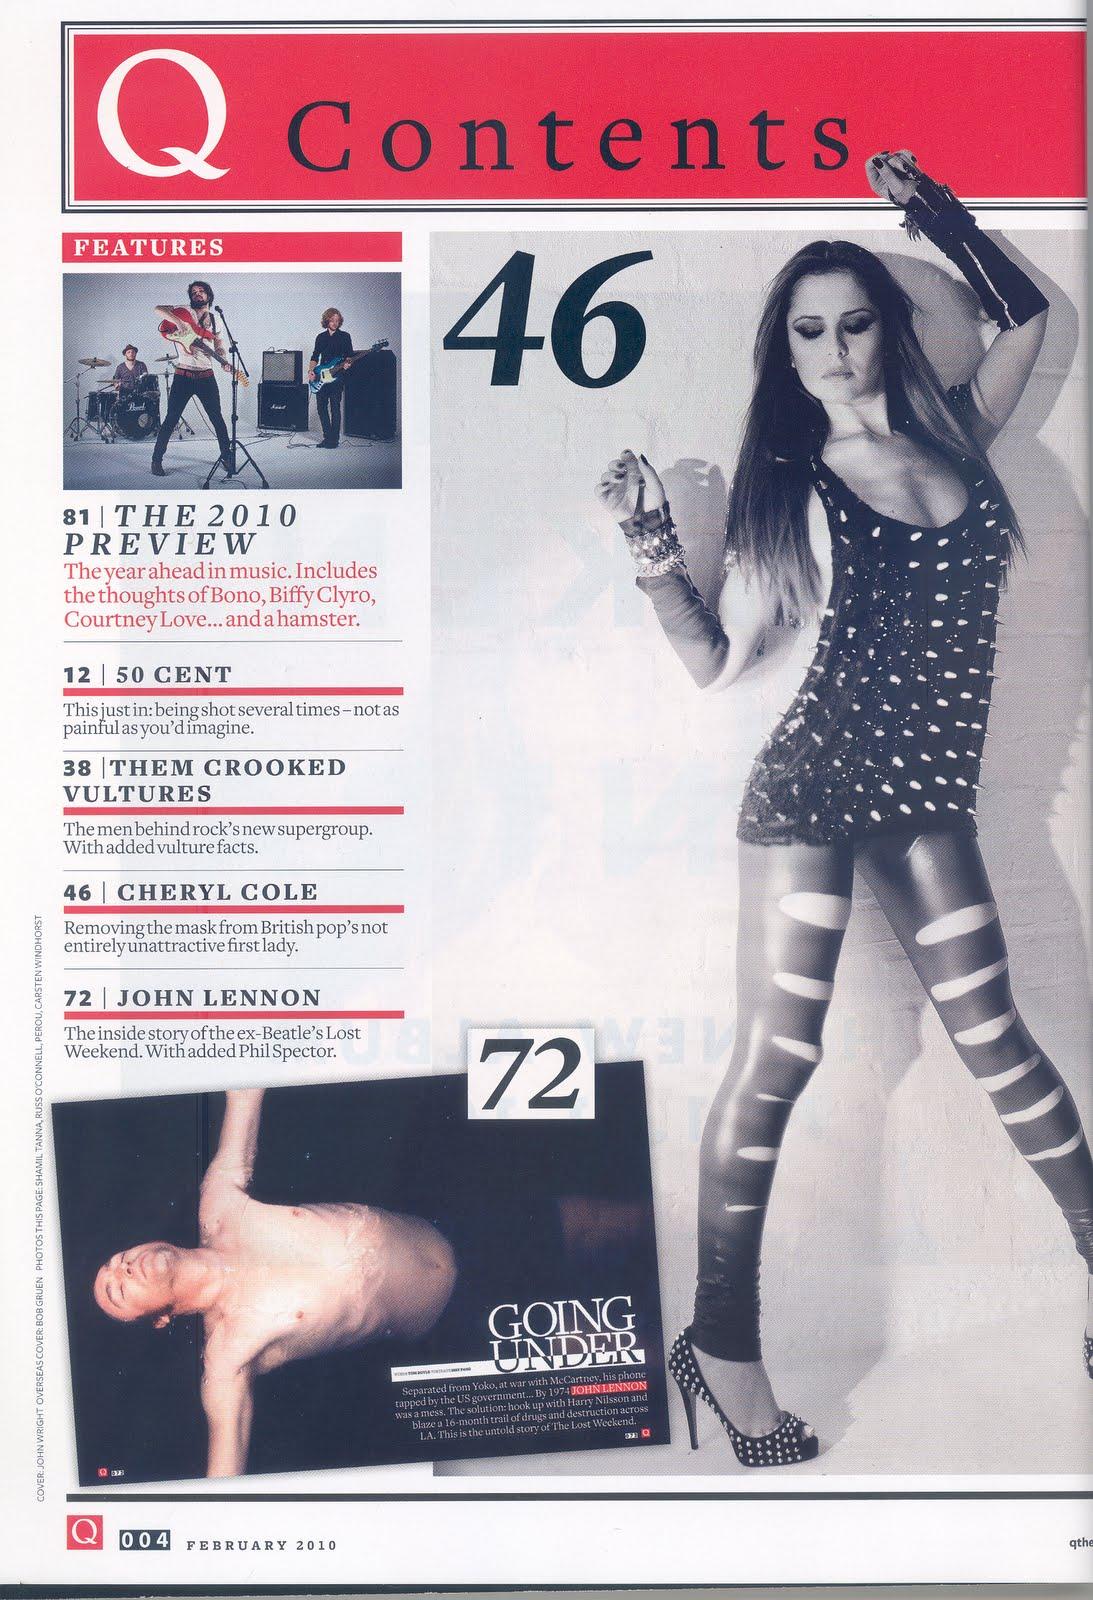 Media GCSE Resources Q Magazine Front Cover Contents  Feature  Cheryl Cole